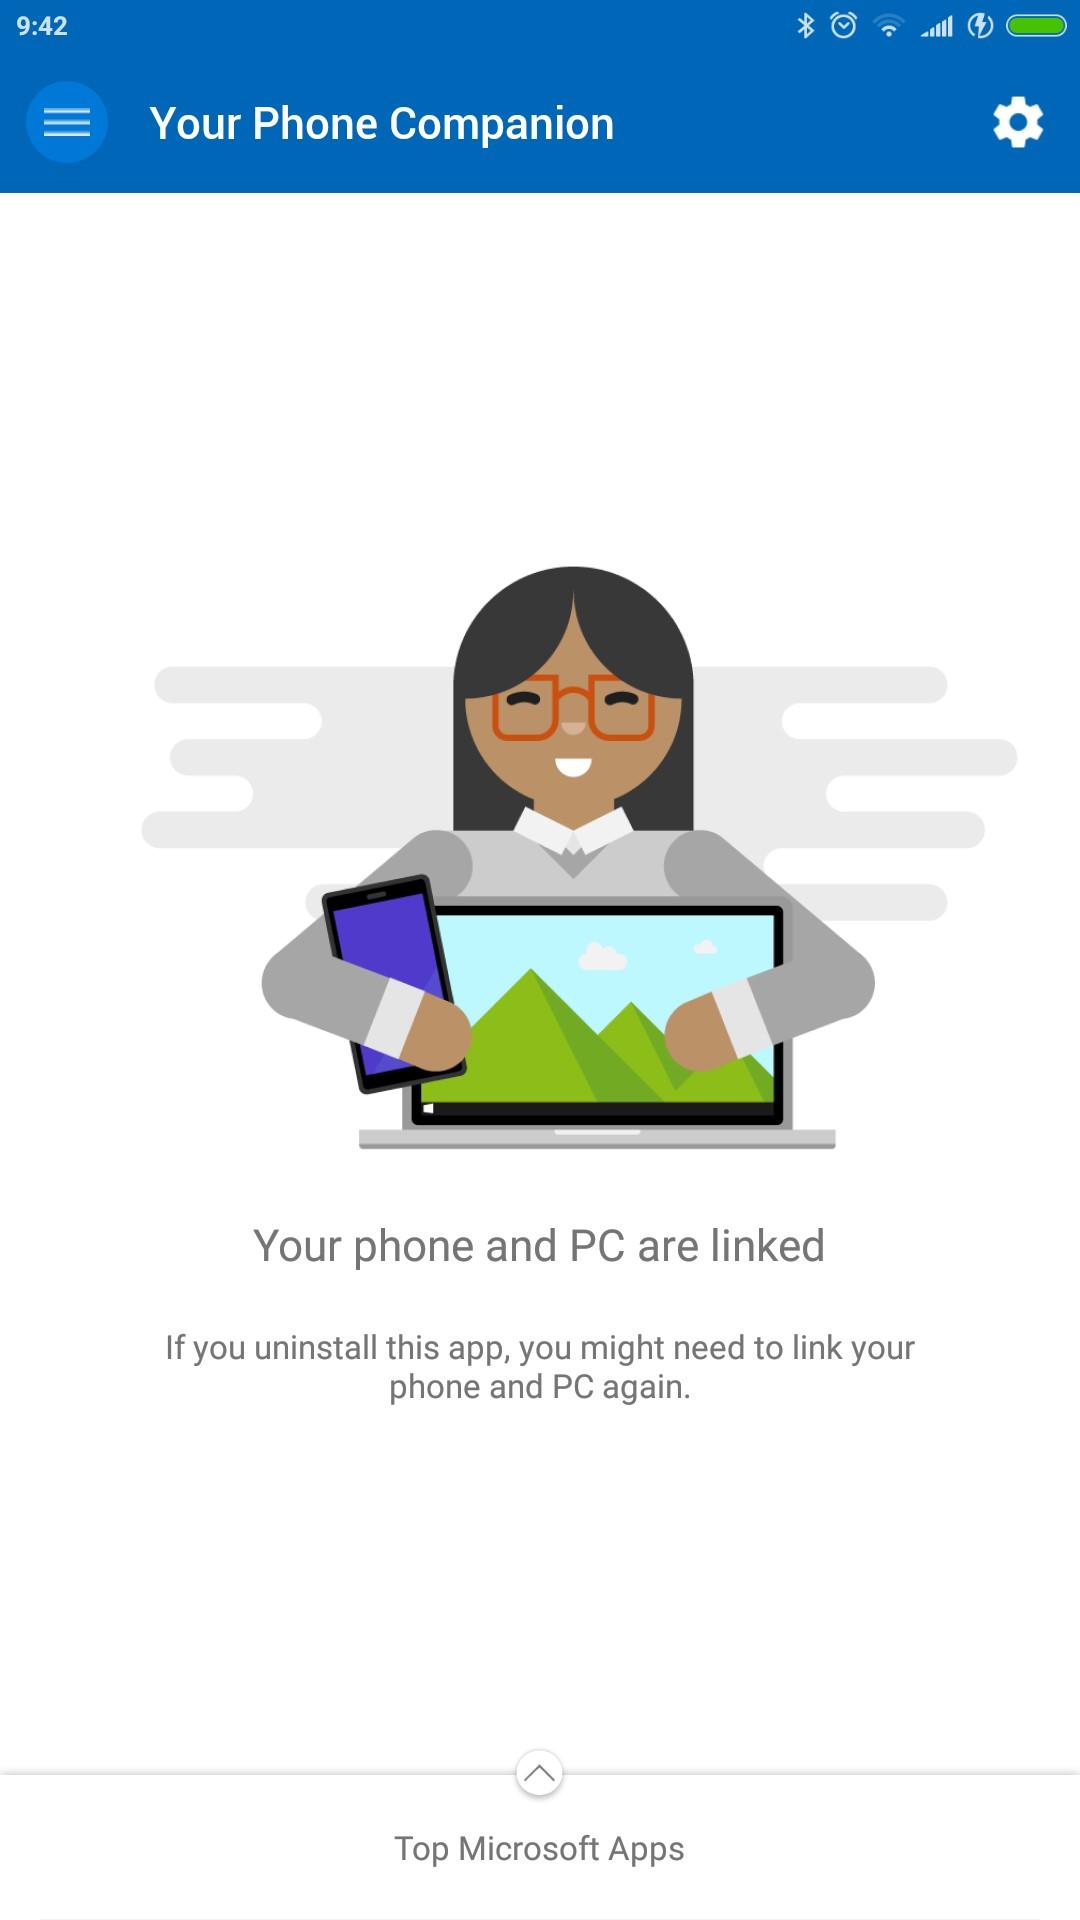 Your Phone Companion app Android pagina principale